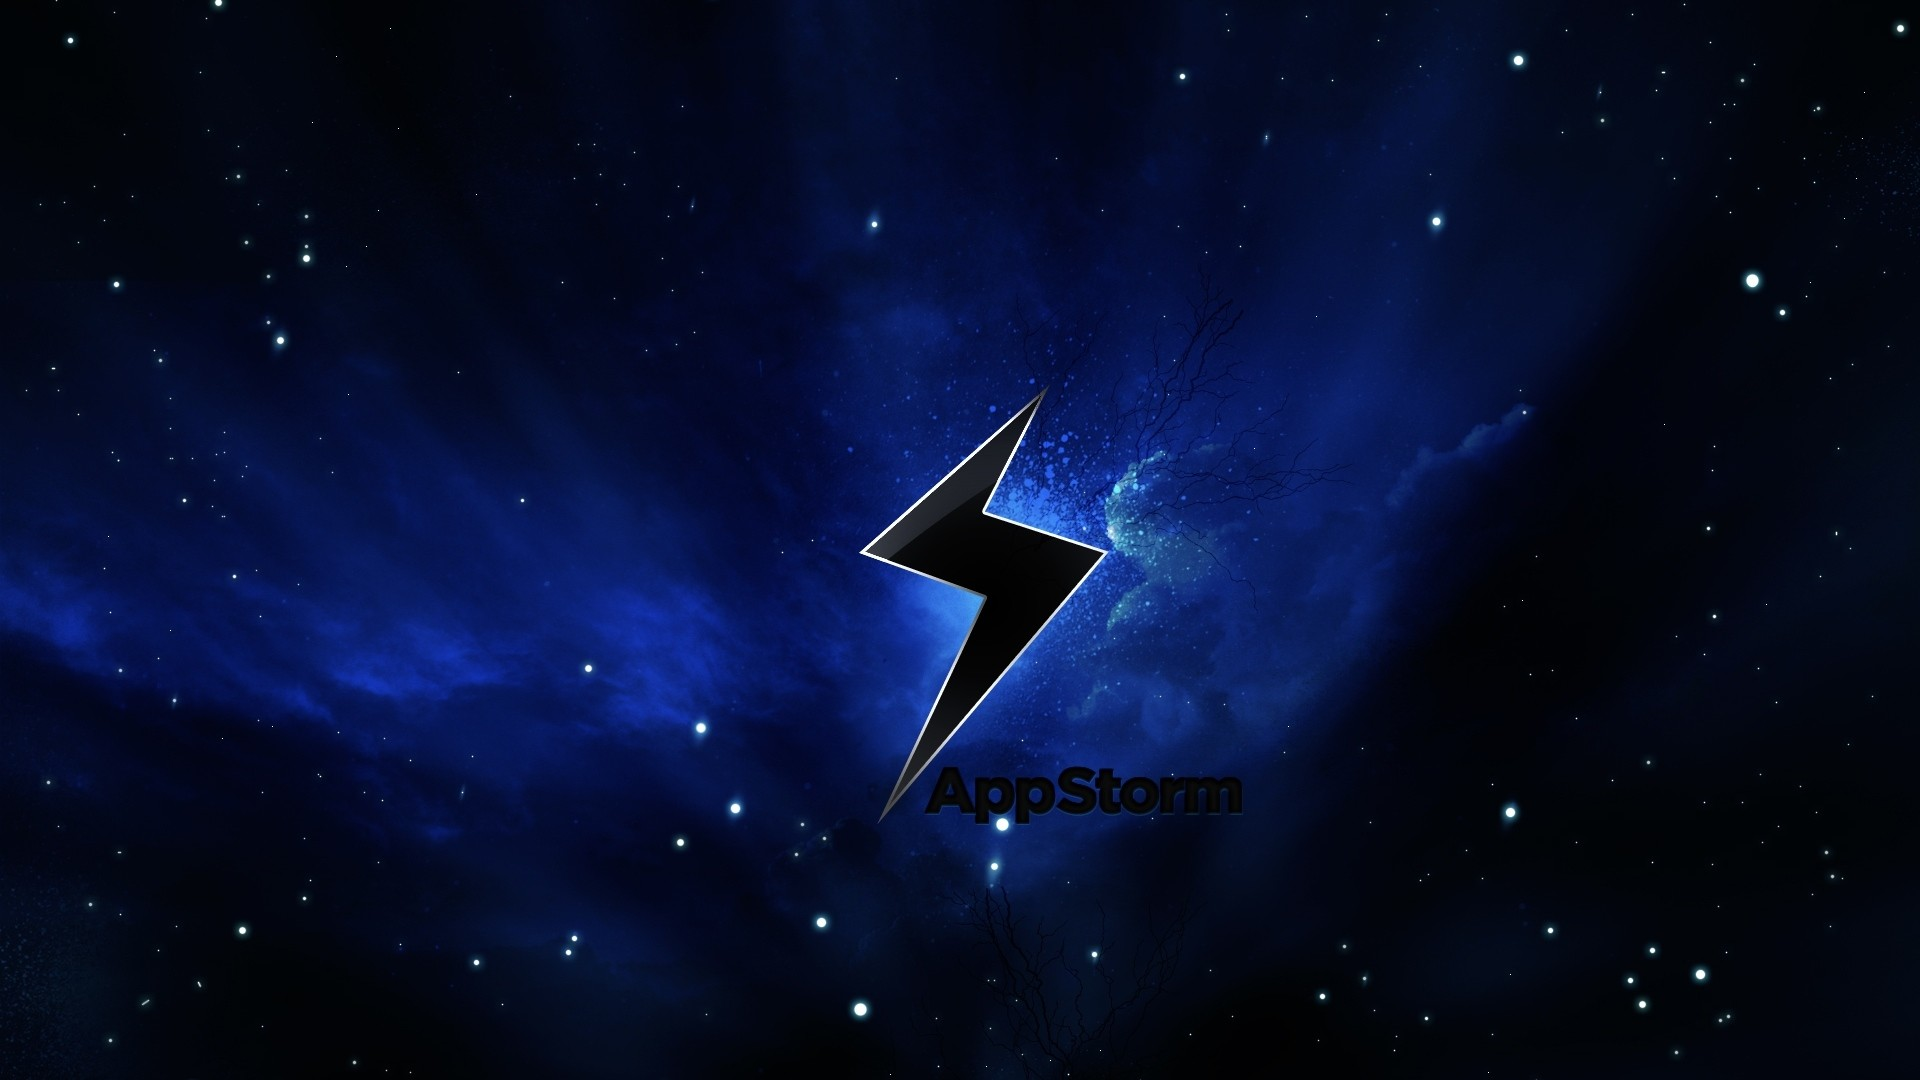 Wallpaper app storm, apple, mac, space, stars, sky, black